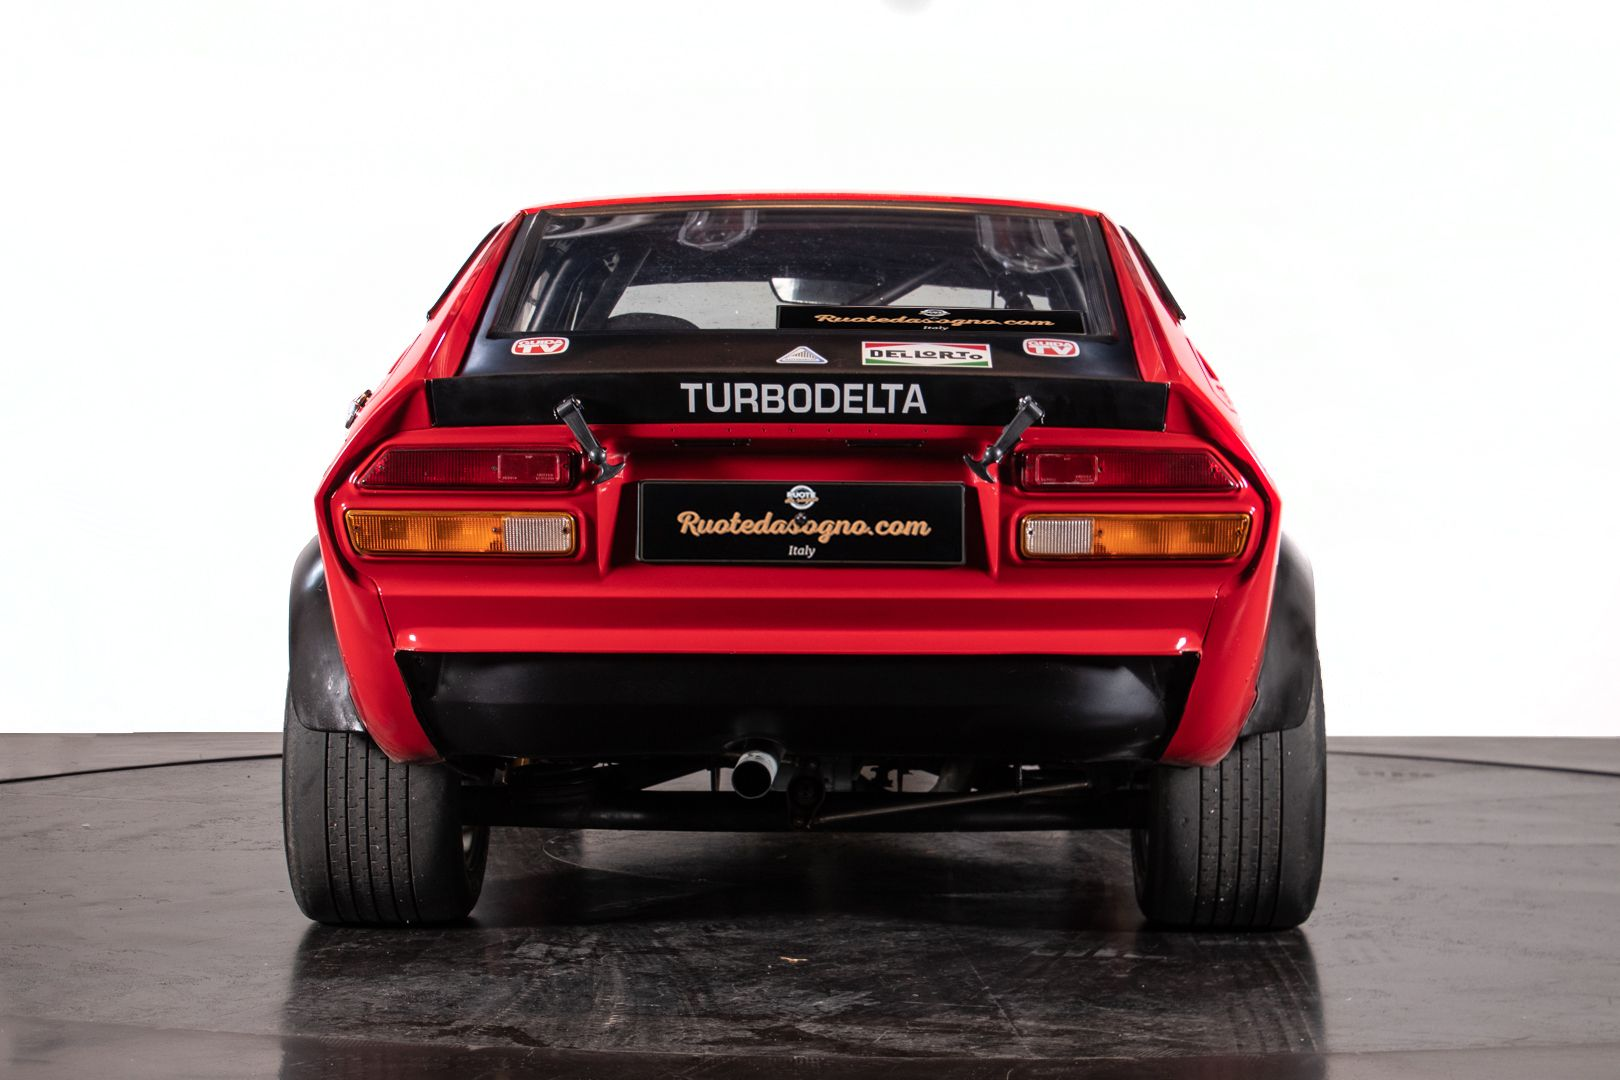 1979 Alfa Romeo Alfetta GTV Turbodelta Gr.4 48427